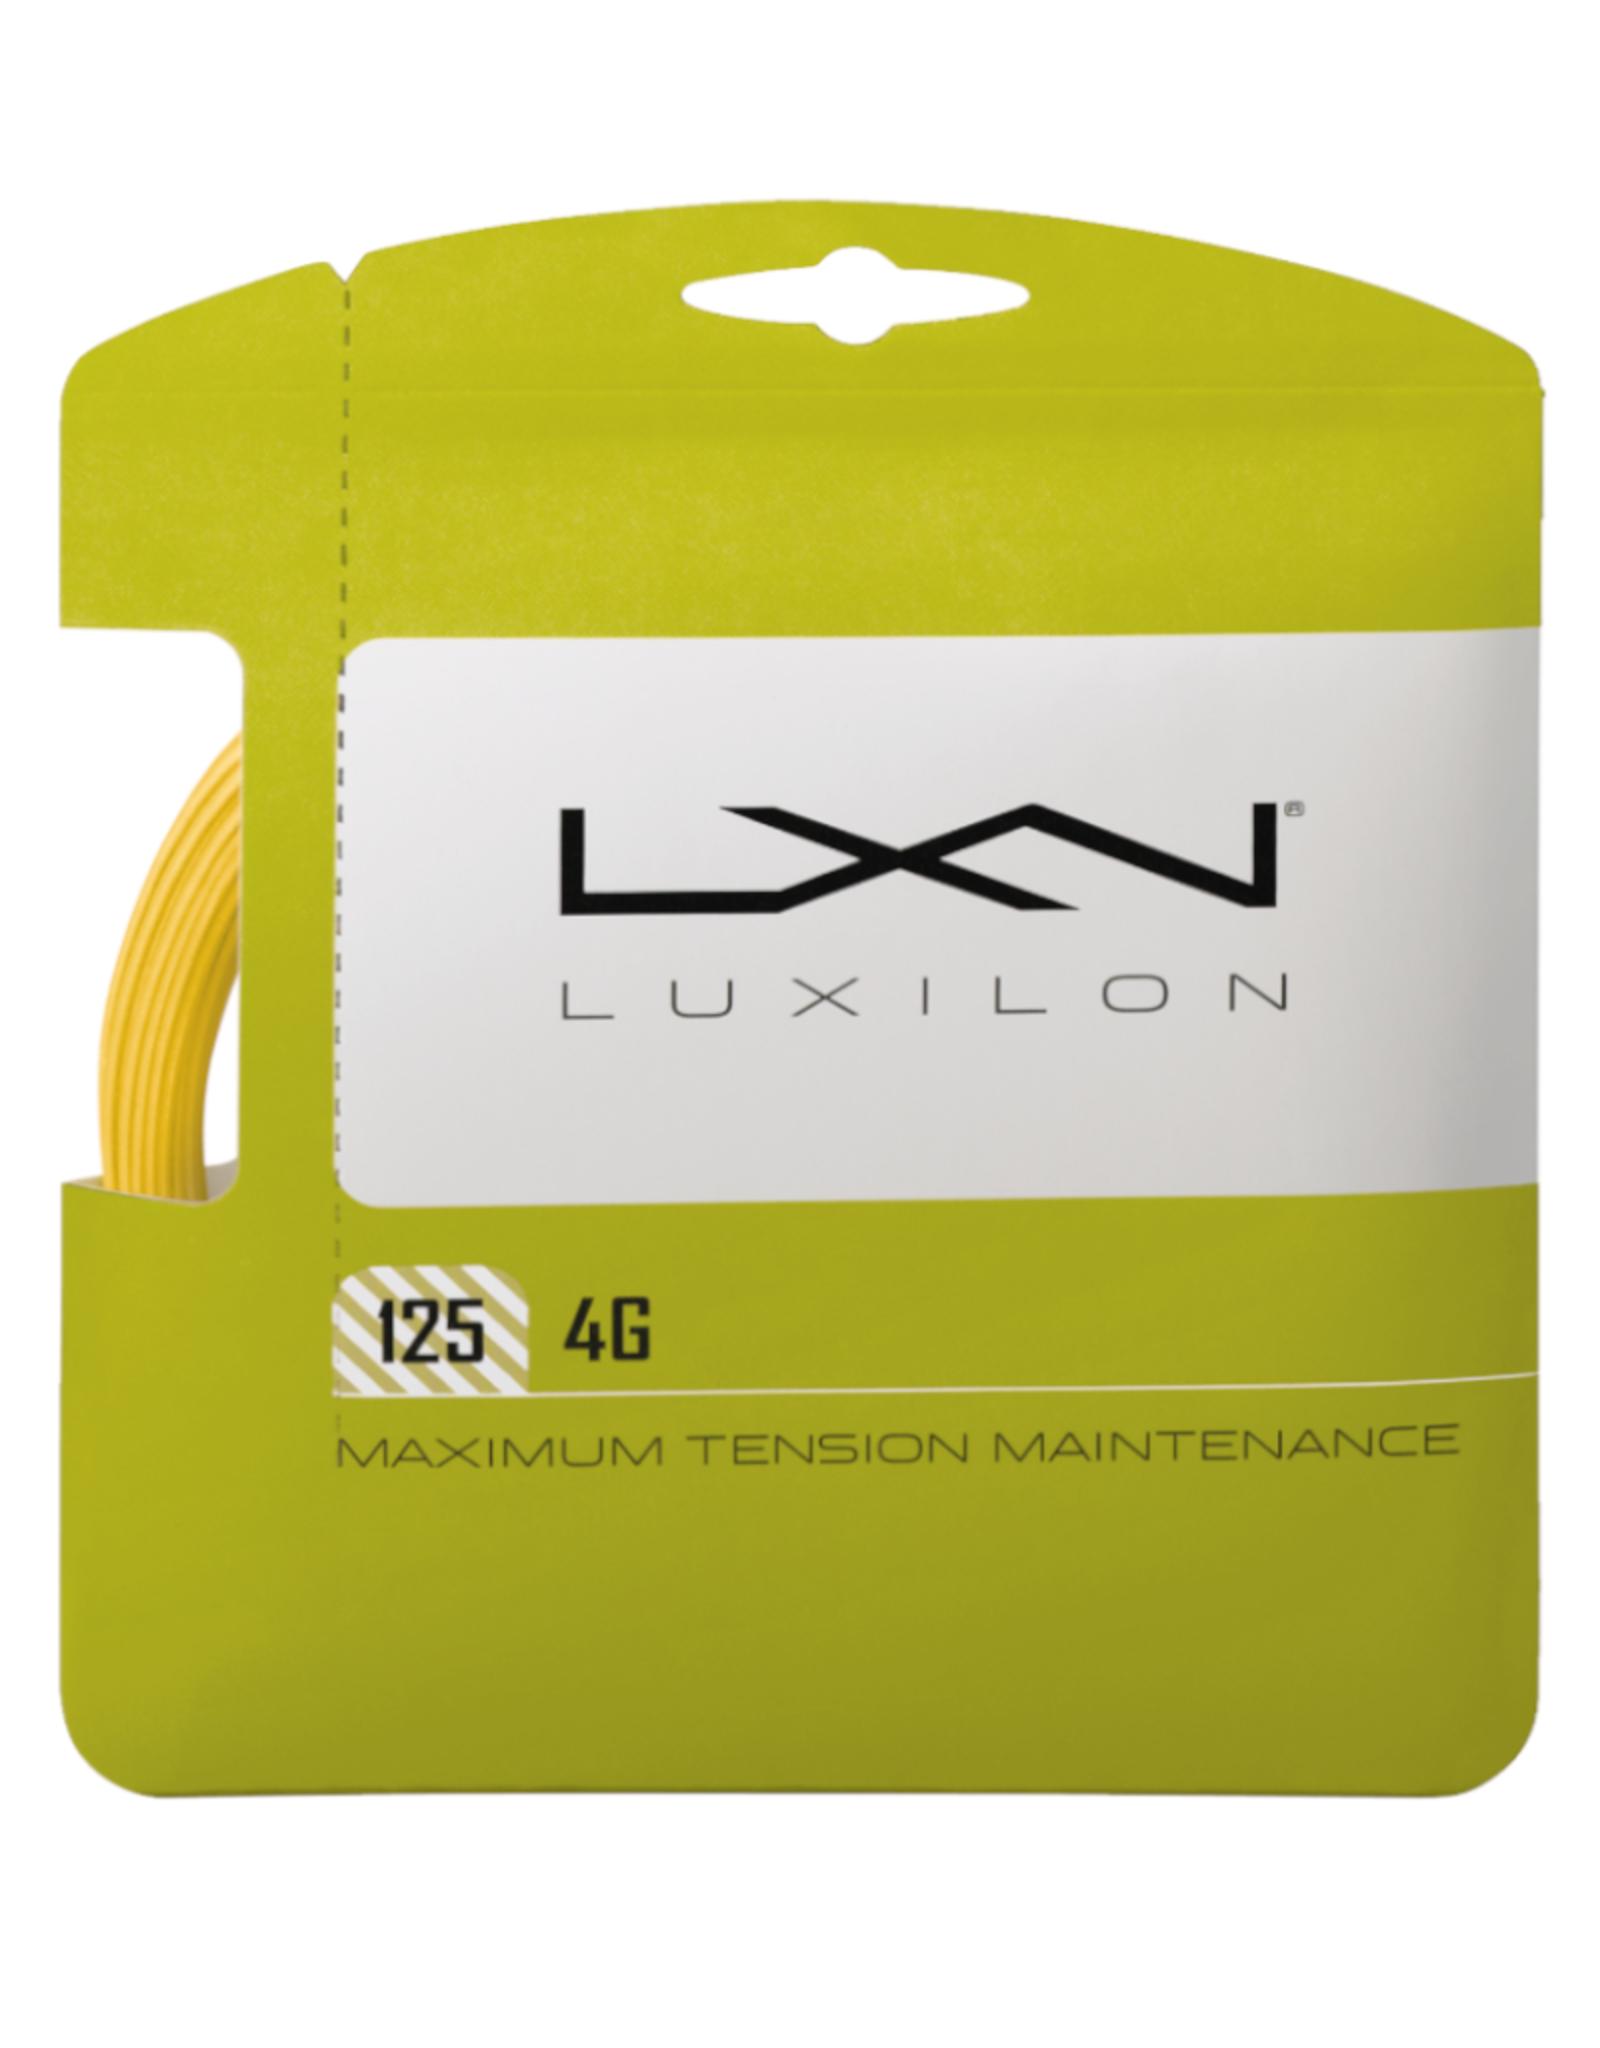 LUXILON 4G 125 FULL SET